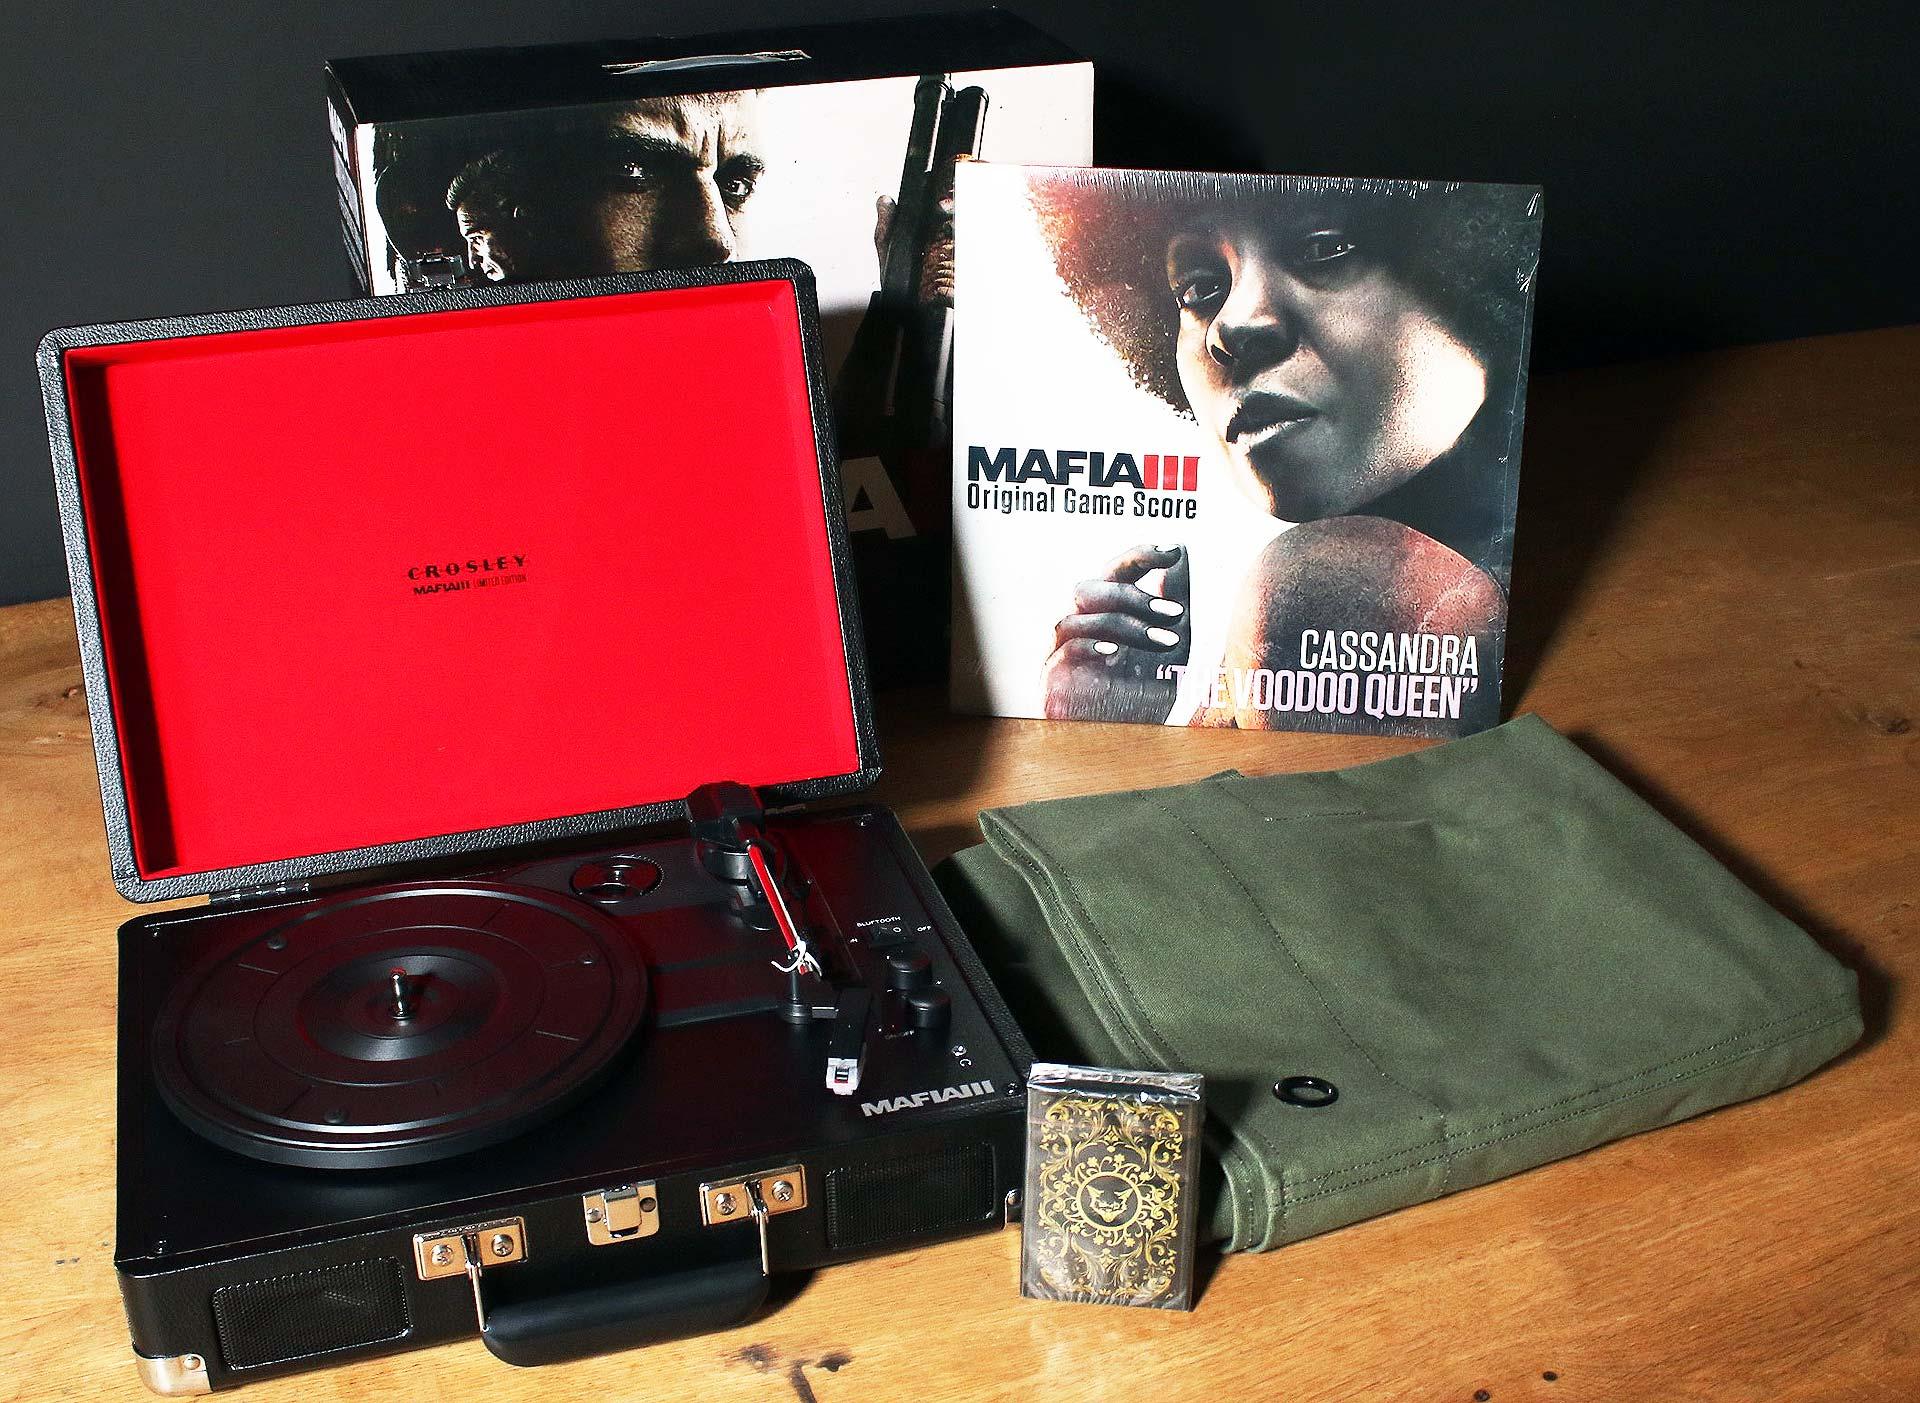 Wir verlosen dieses Fanpaket zu Mafia III